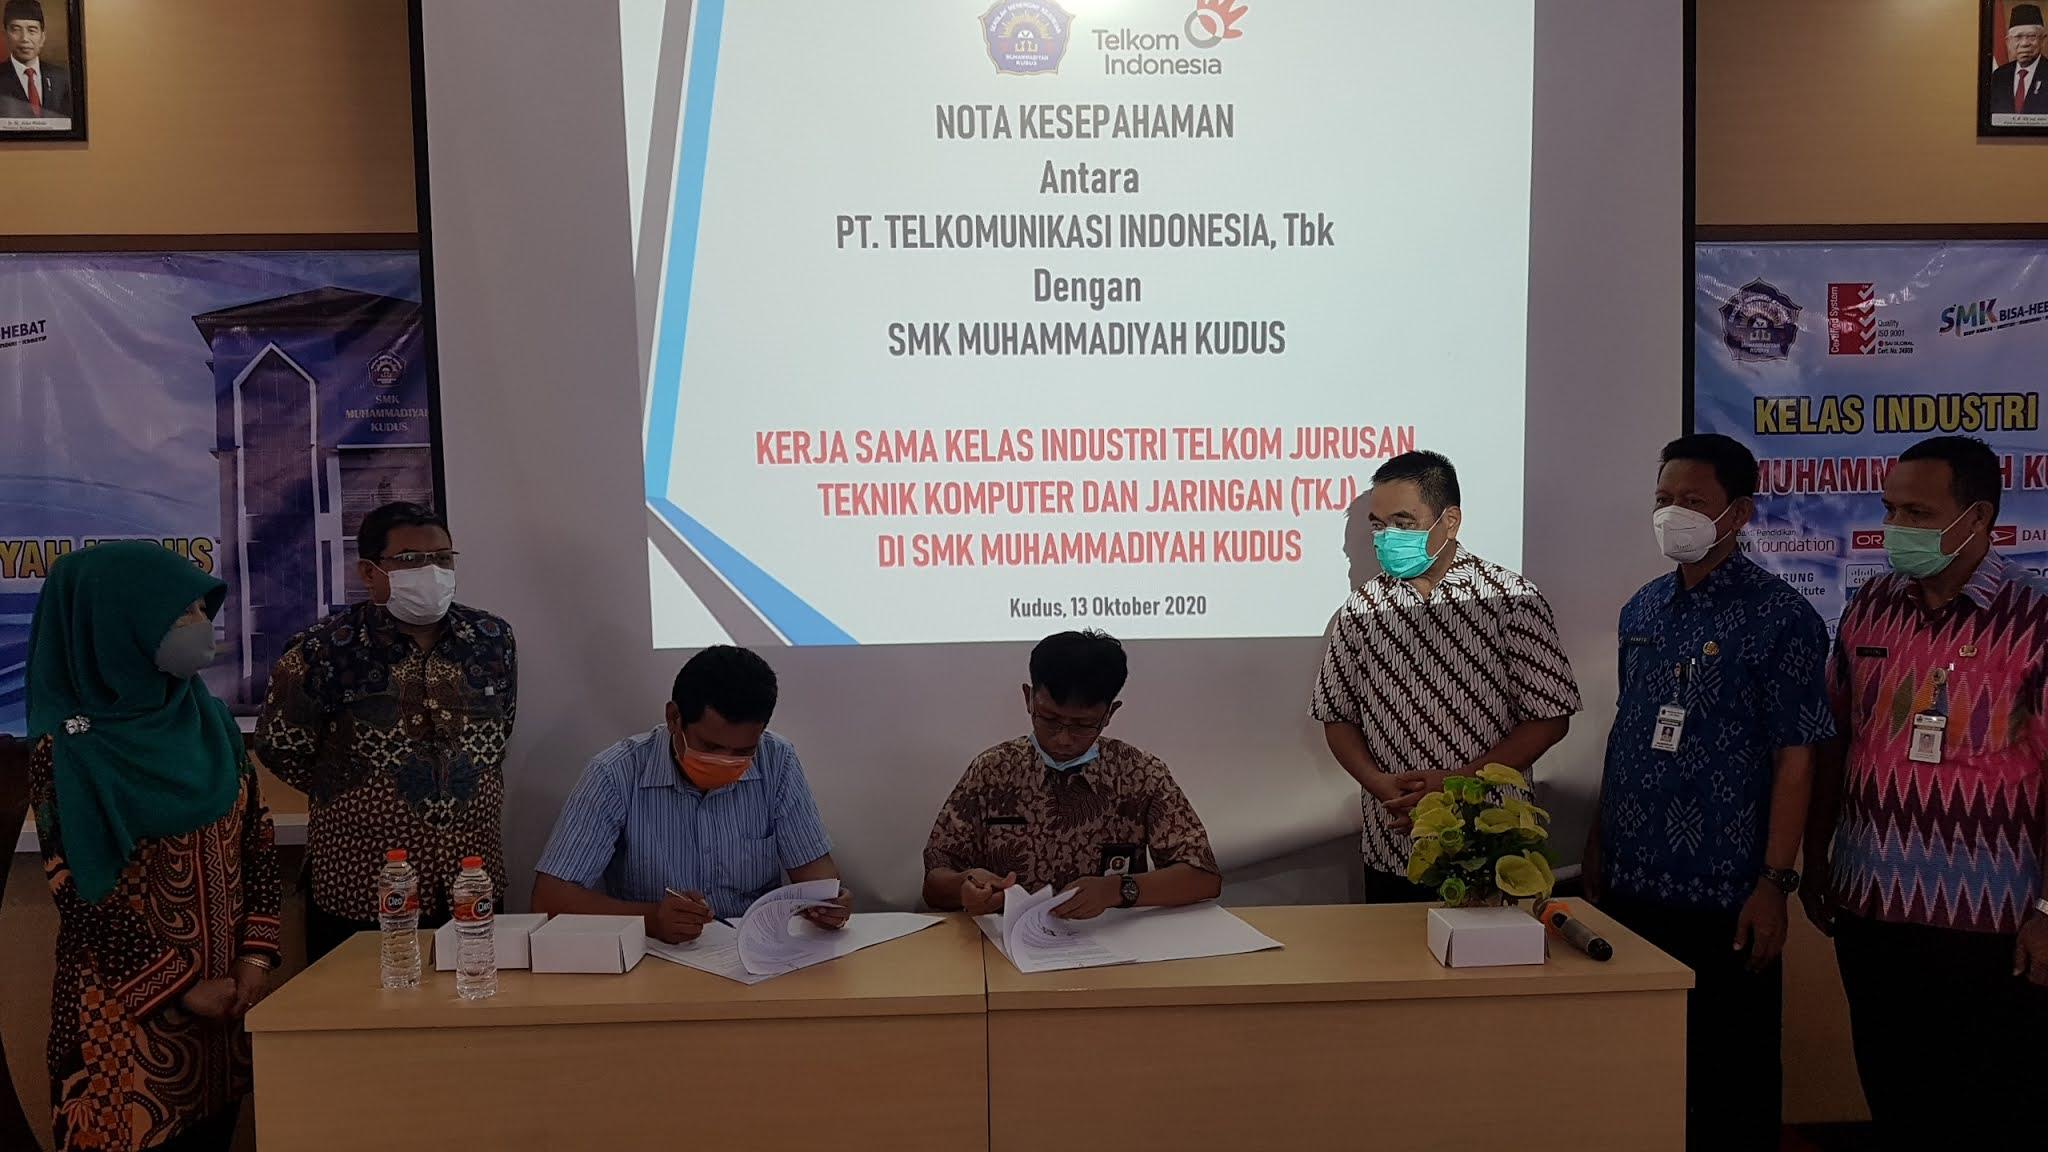 Gandeng PT Telkom Indonesia, SMK Muhammadiyah Kudus Buka Kelas CoE